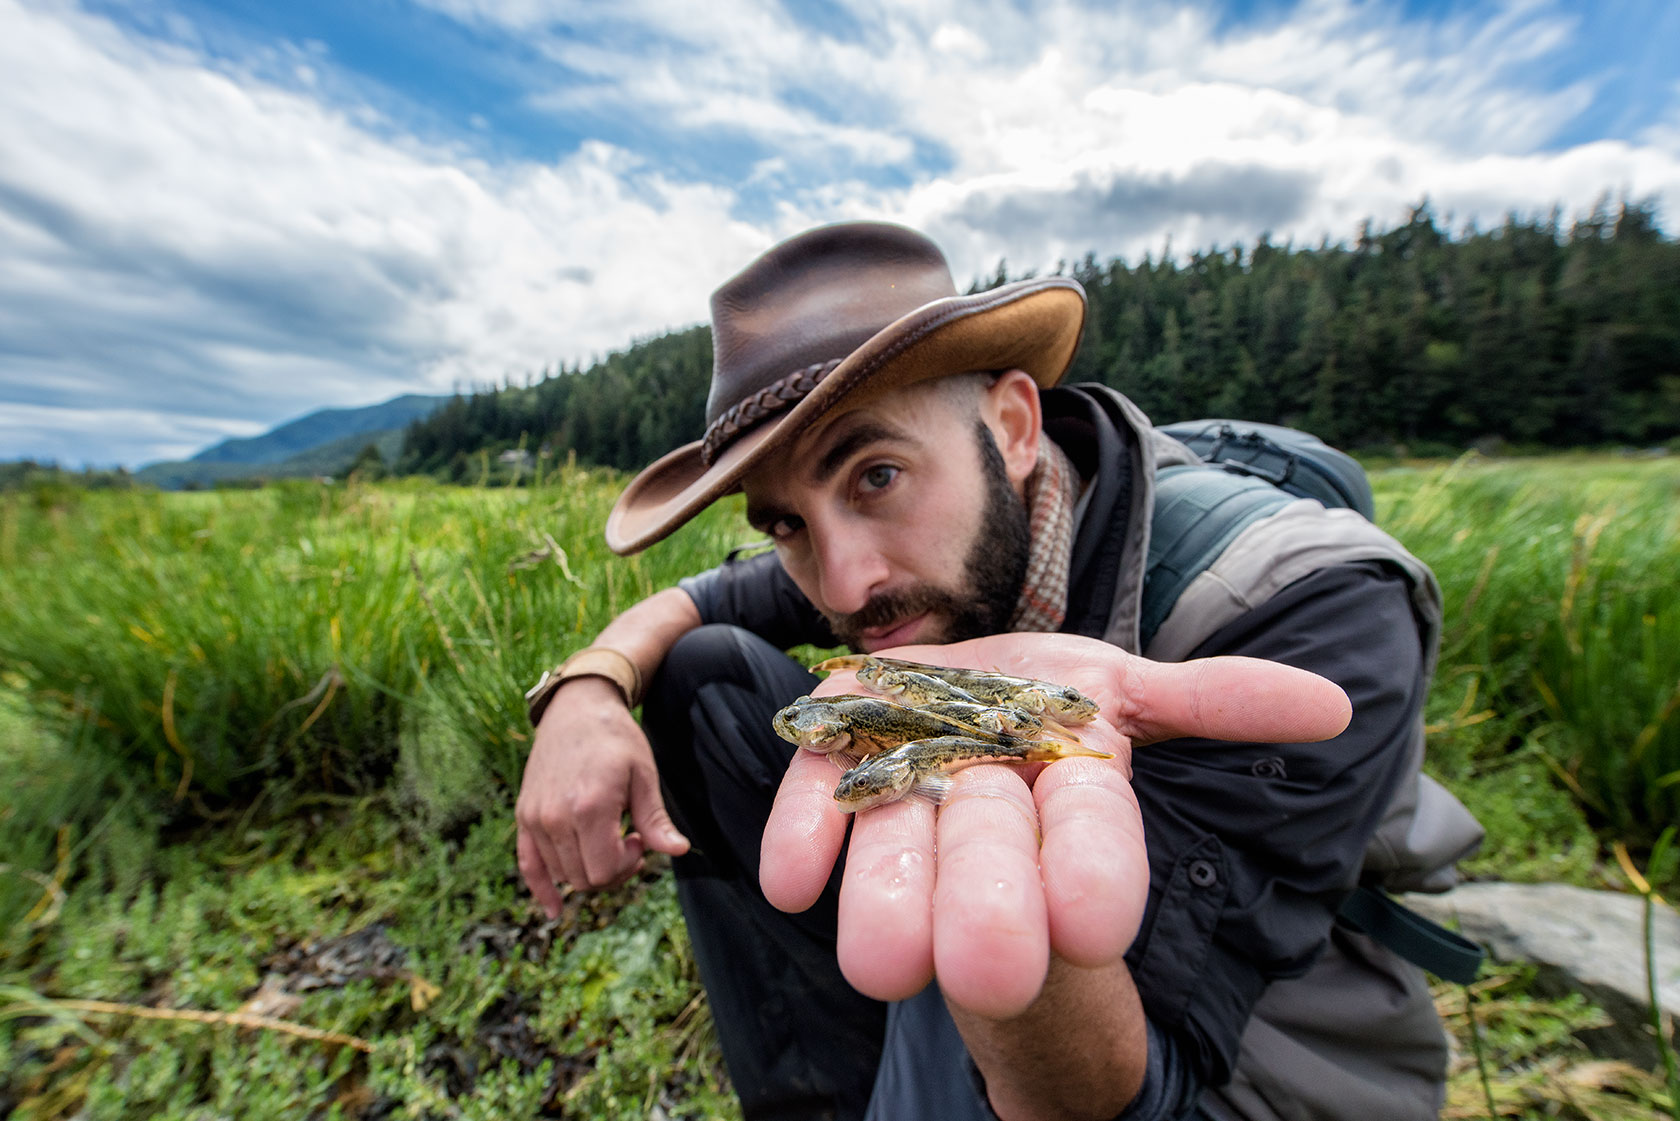 austin-trigg-brave-wilderness-alaska-BW-Coyote-Shows-sculpin-Fish-Mud-Bay.jpg